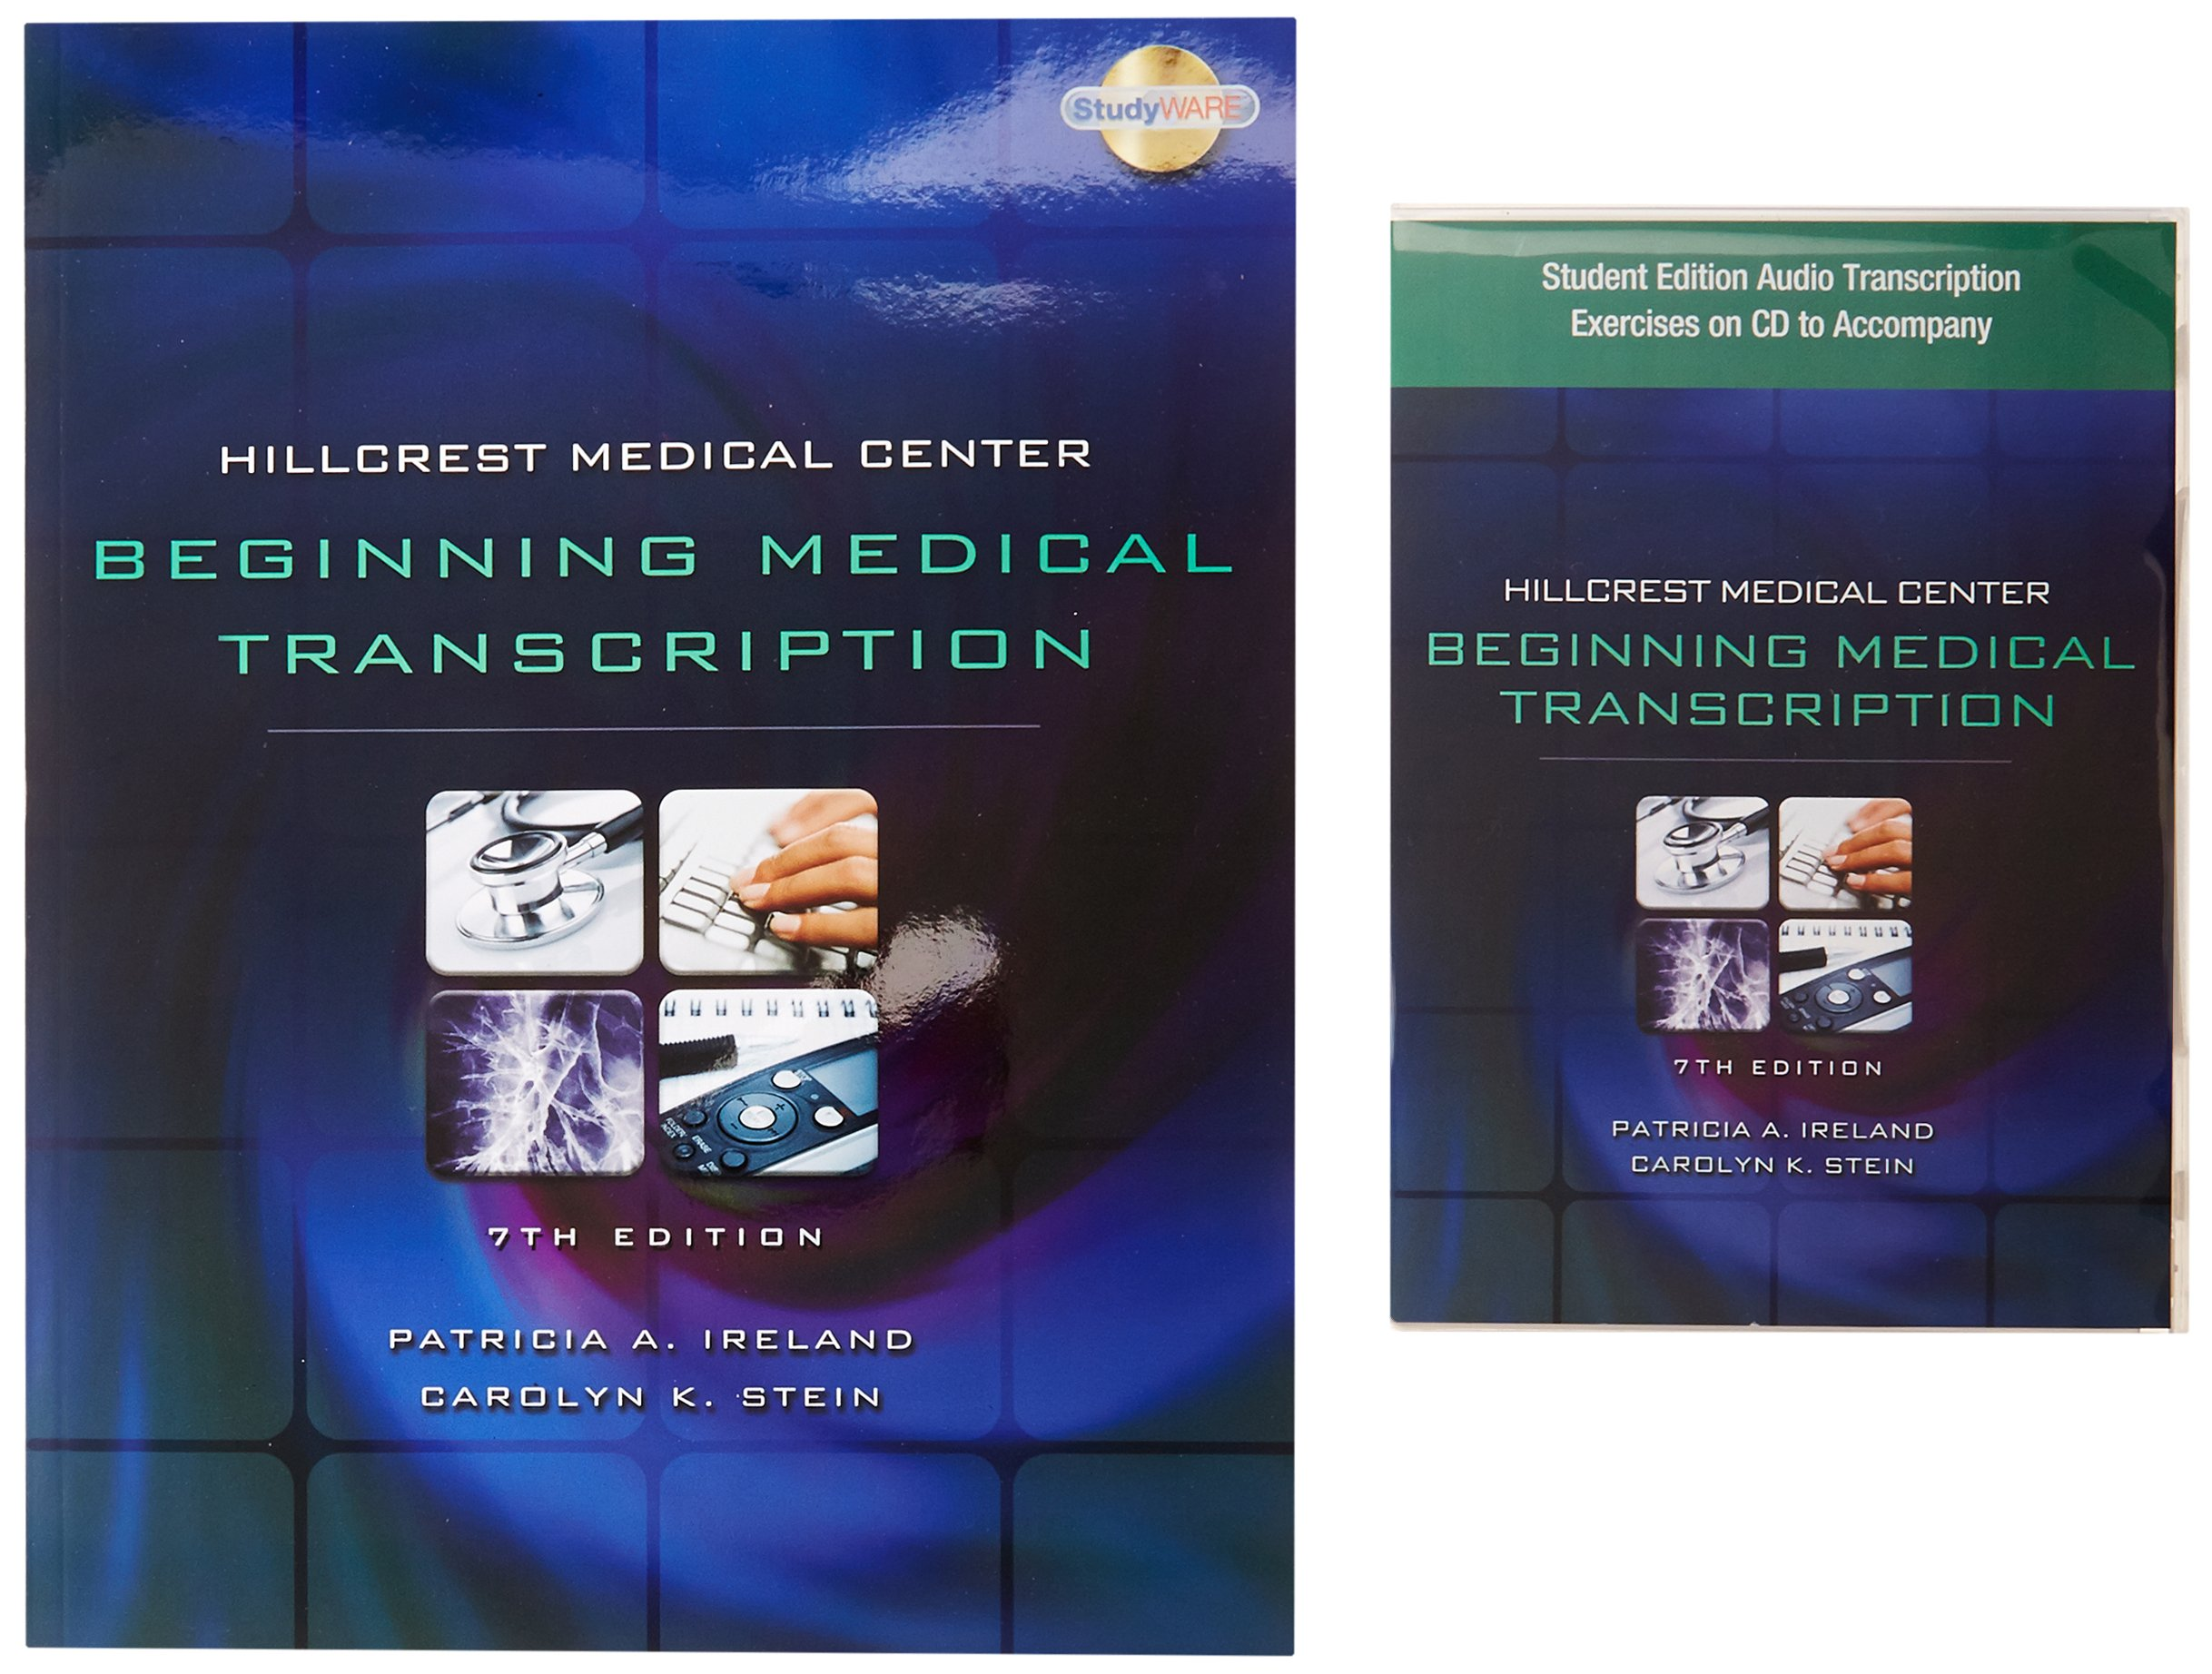 Bundle: Hillcrest Medical Center: Beginning Medical Transcription, 7th + All N' One Transcription Kit from Martel Electronics + Student Edition Audio Exercises on CD